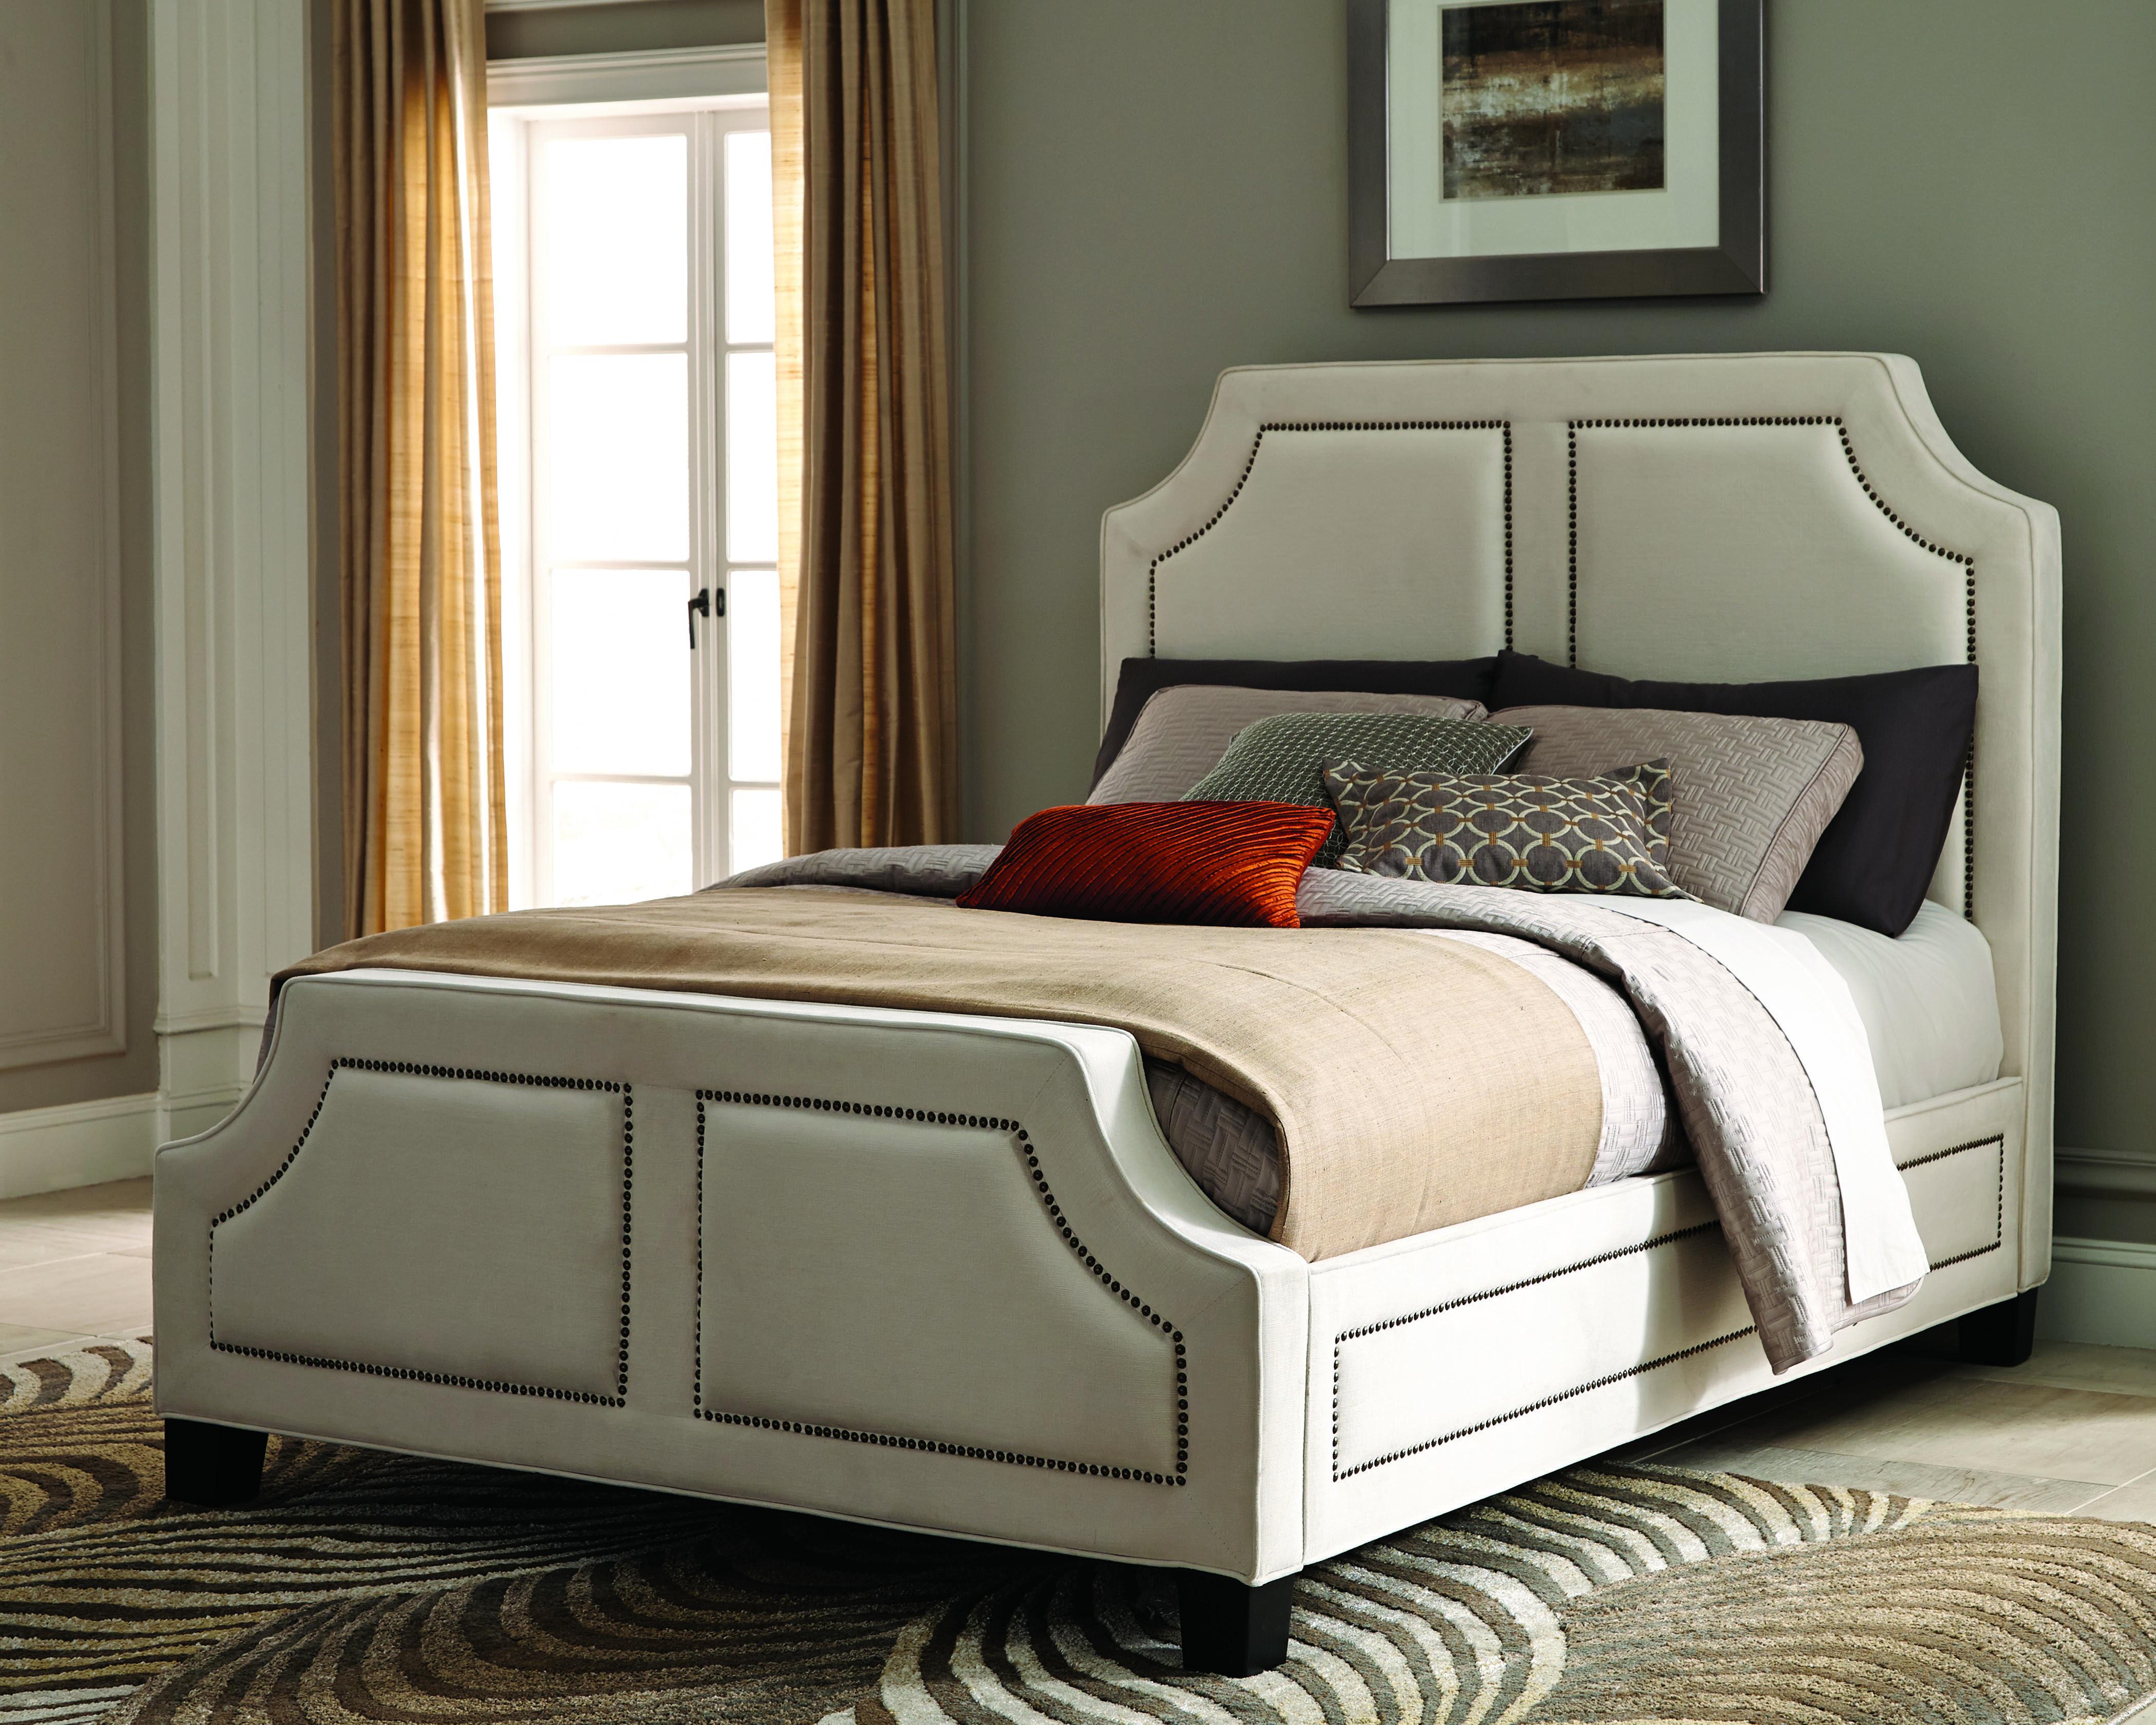 Bedroom // Donny Osmond Home White queen bed, King